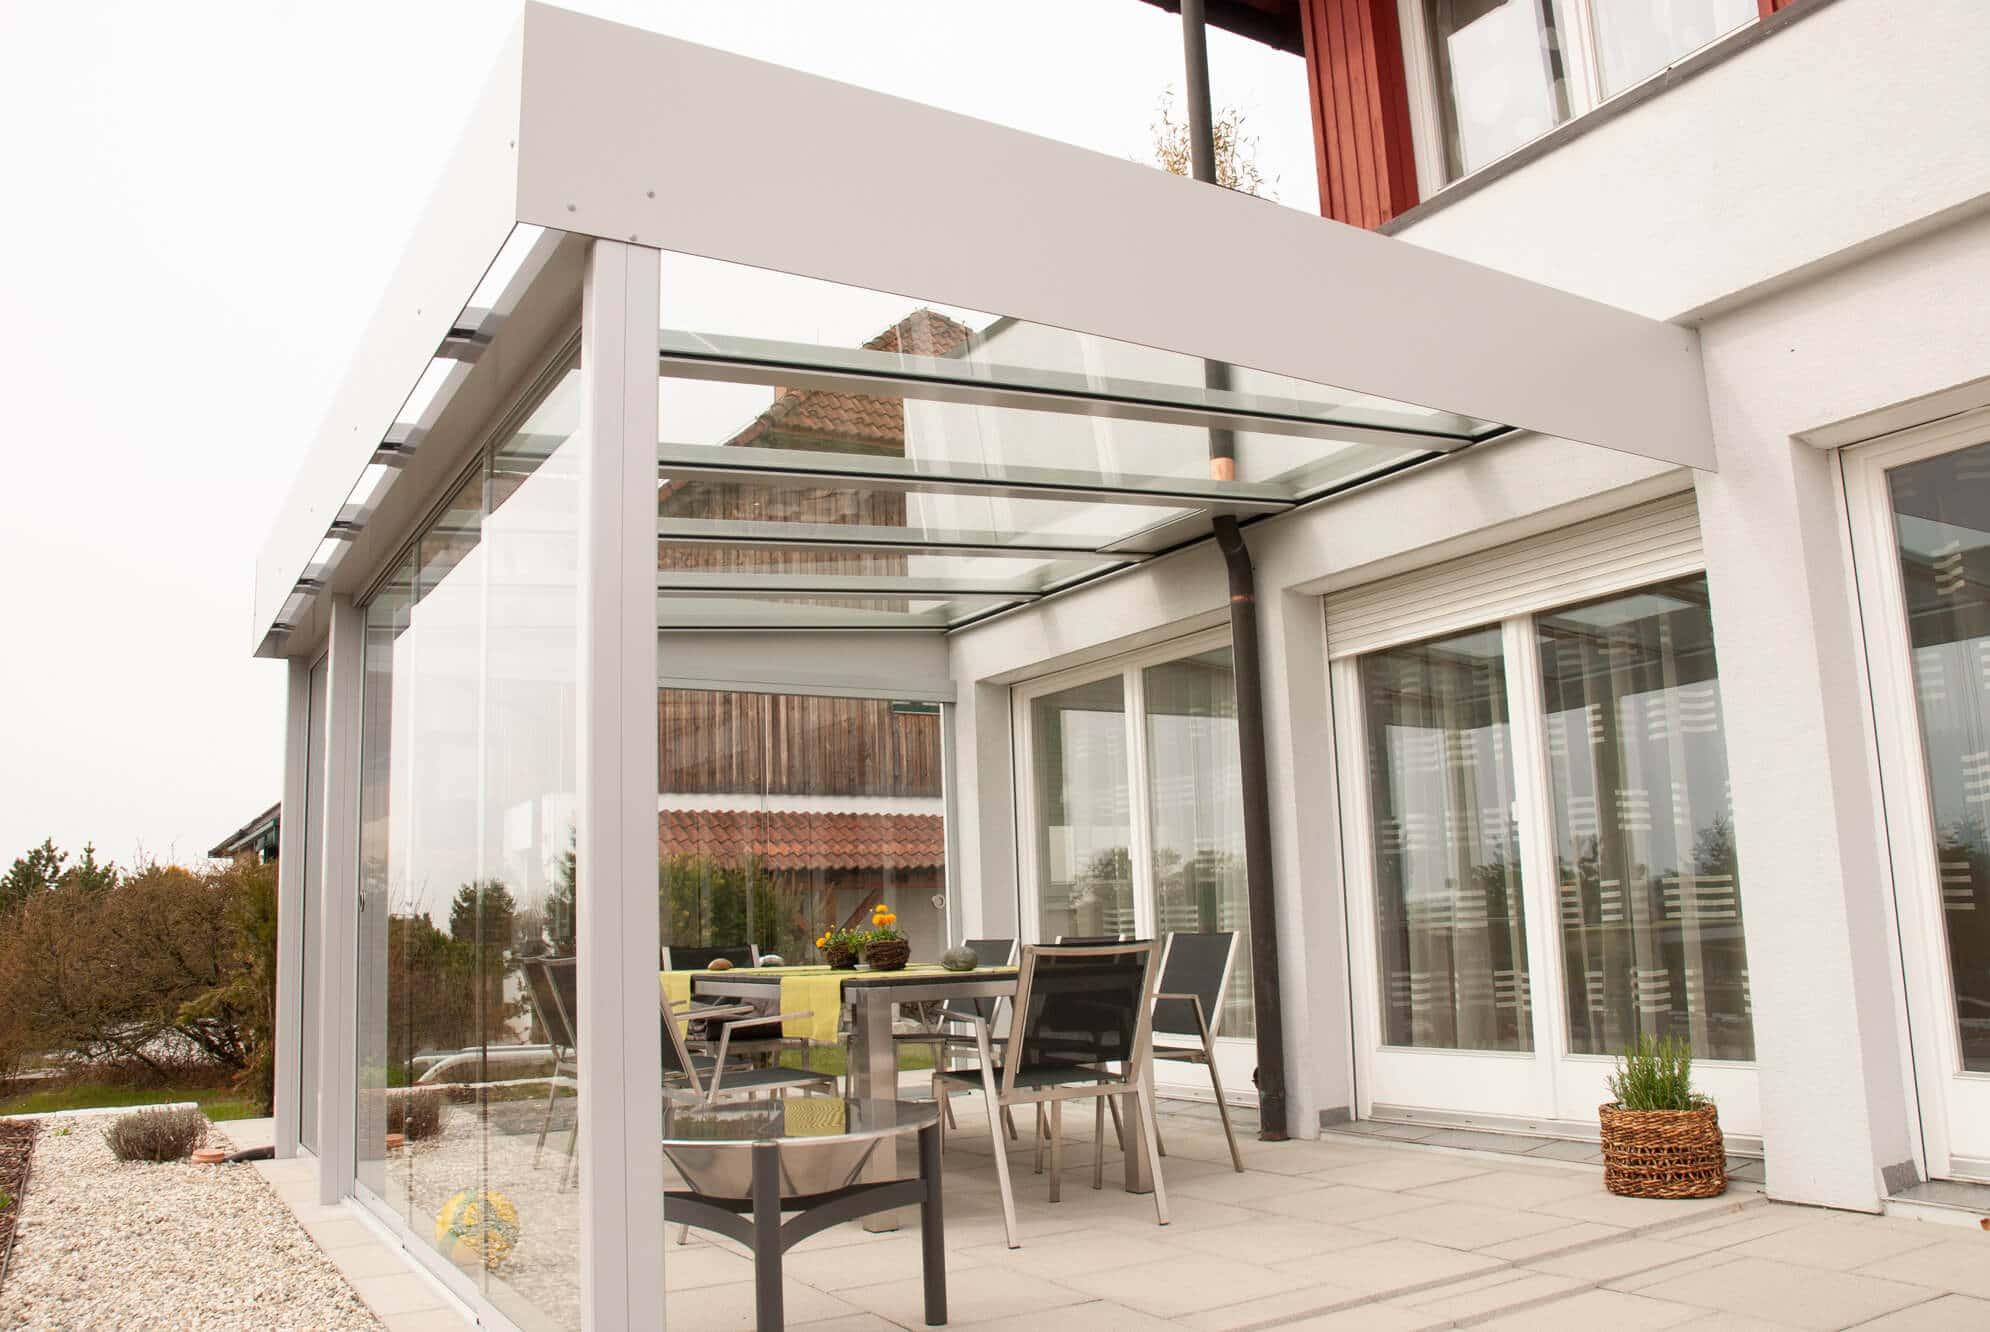 Terrassenuberdachung Schiebetur Glasschiebewand Fenster Schmidinger